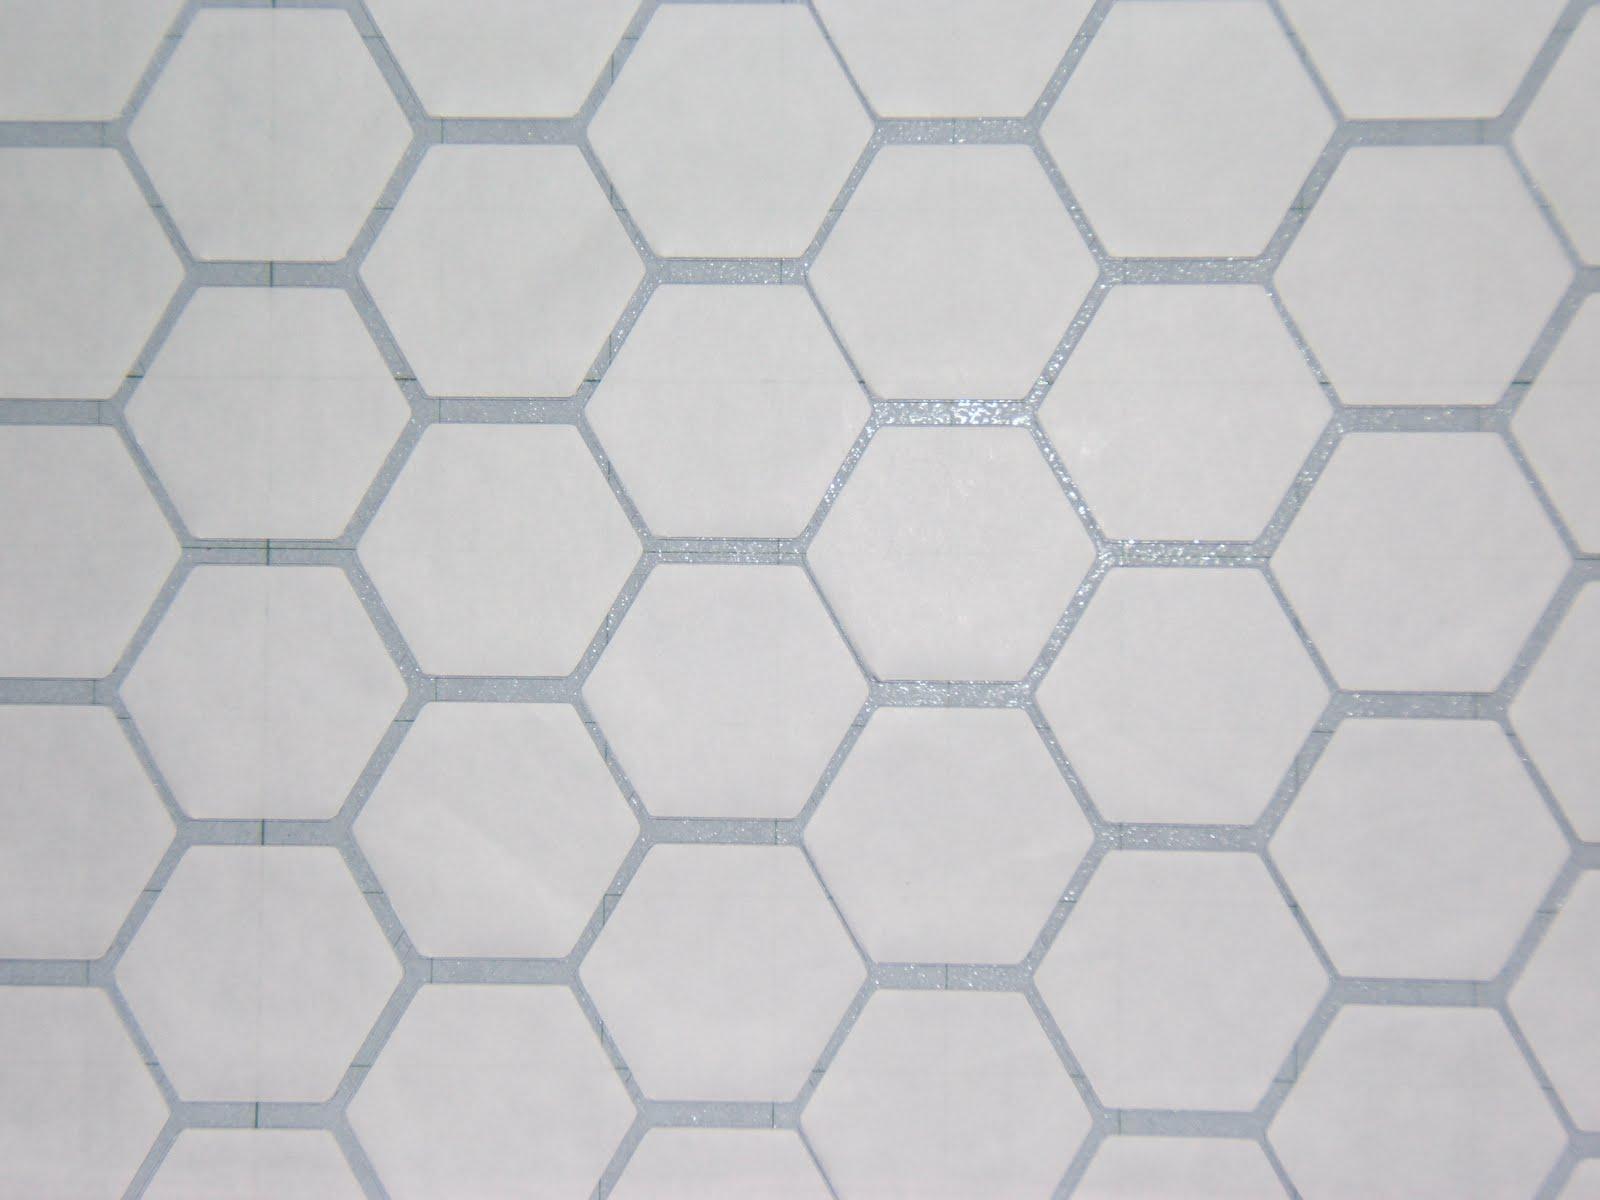 1 5 inch hexagon quilt template for 1 5 inch hexagon template